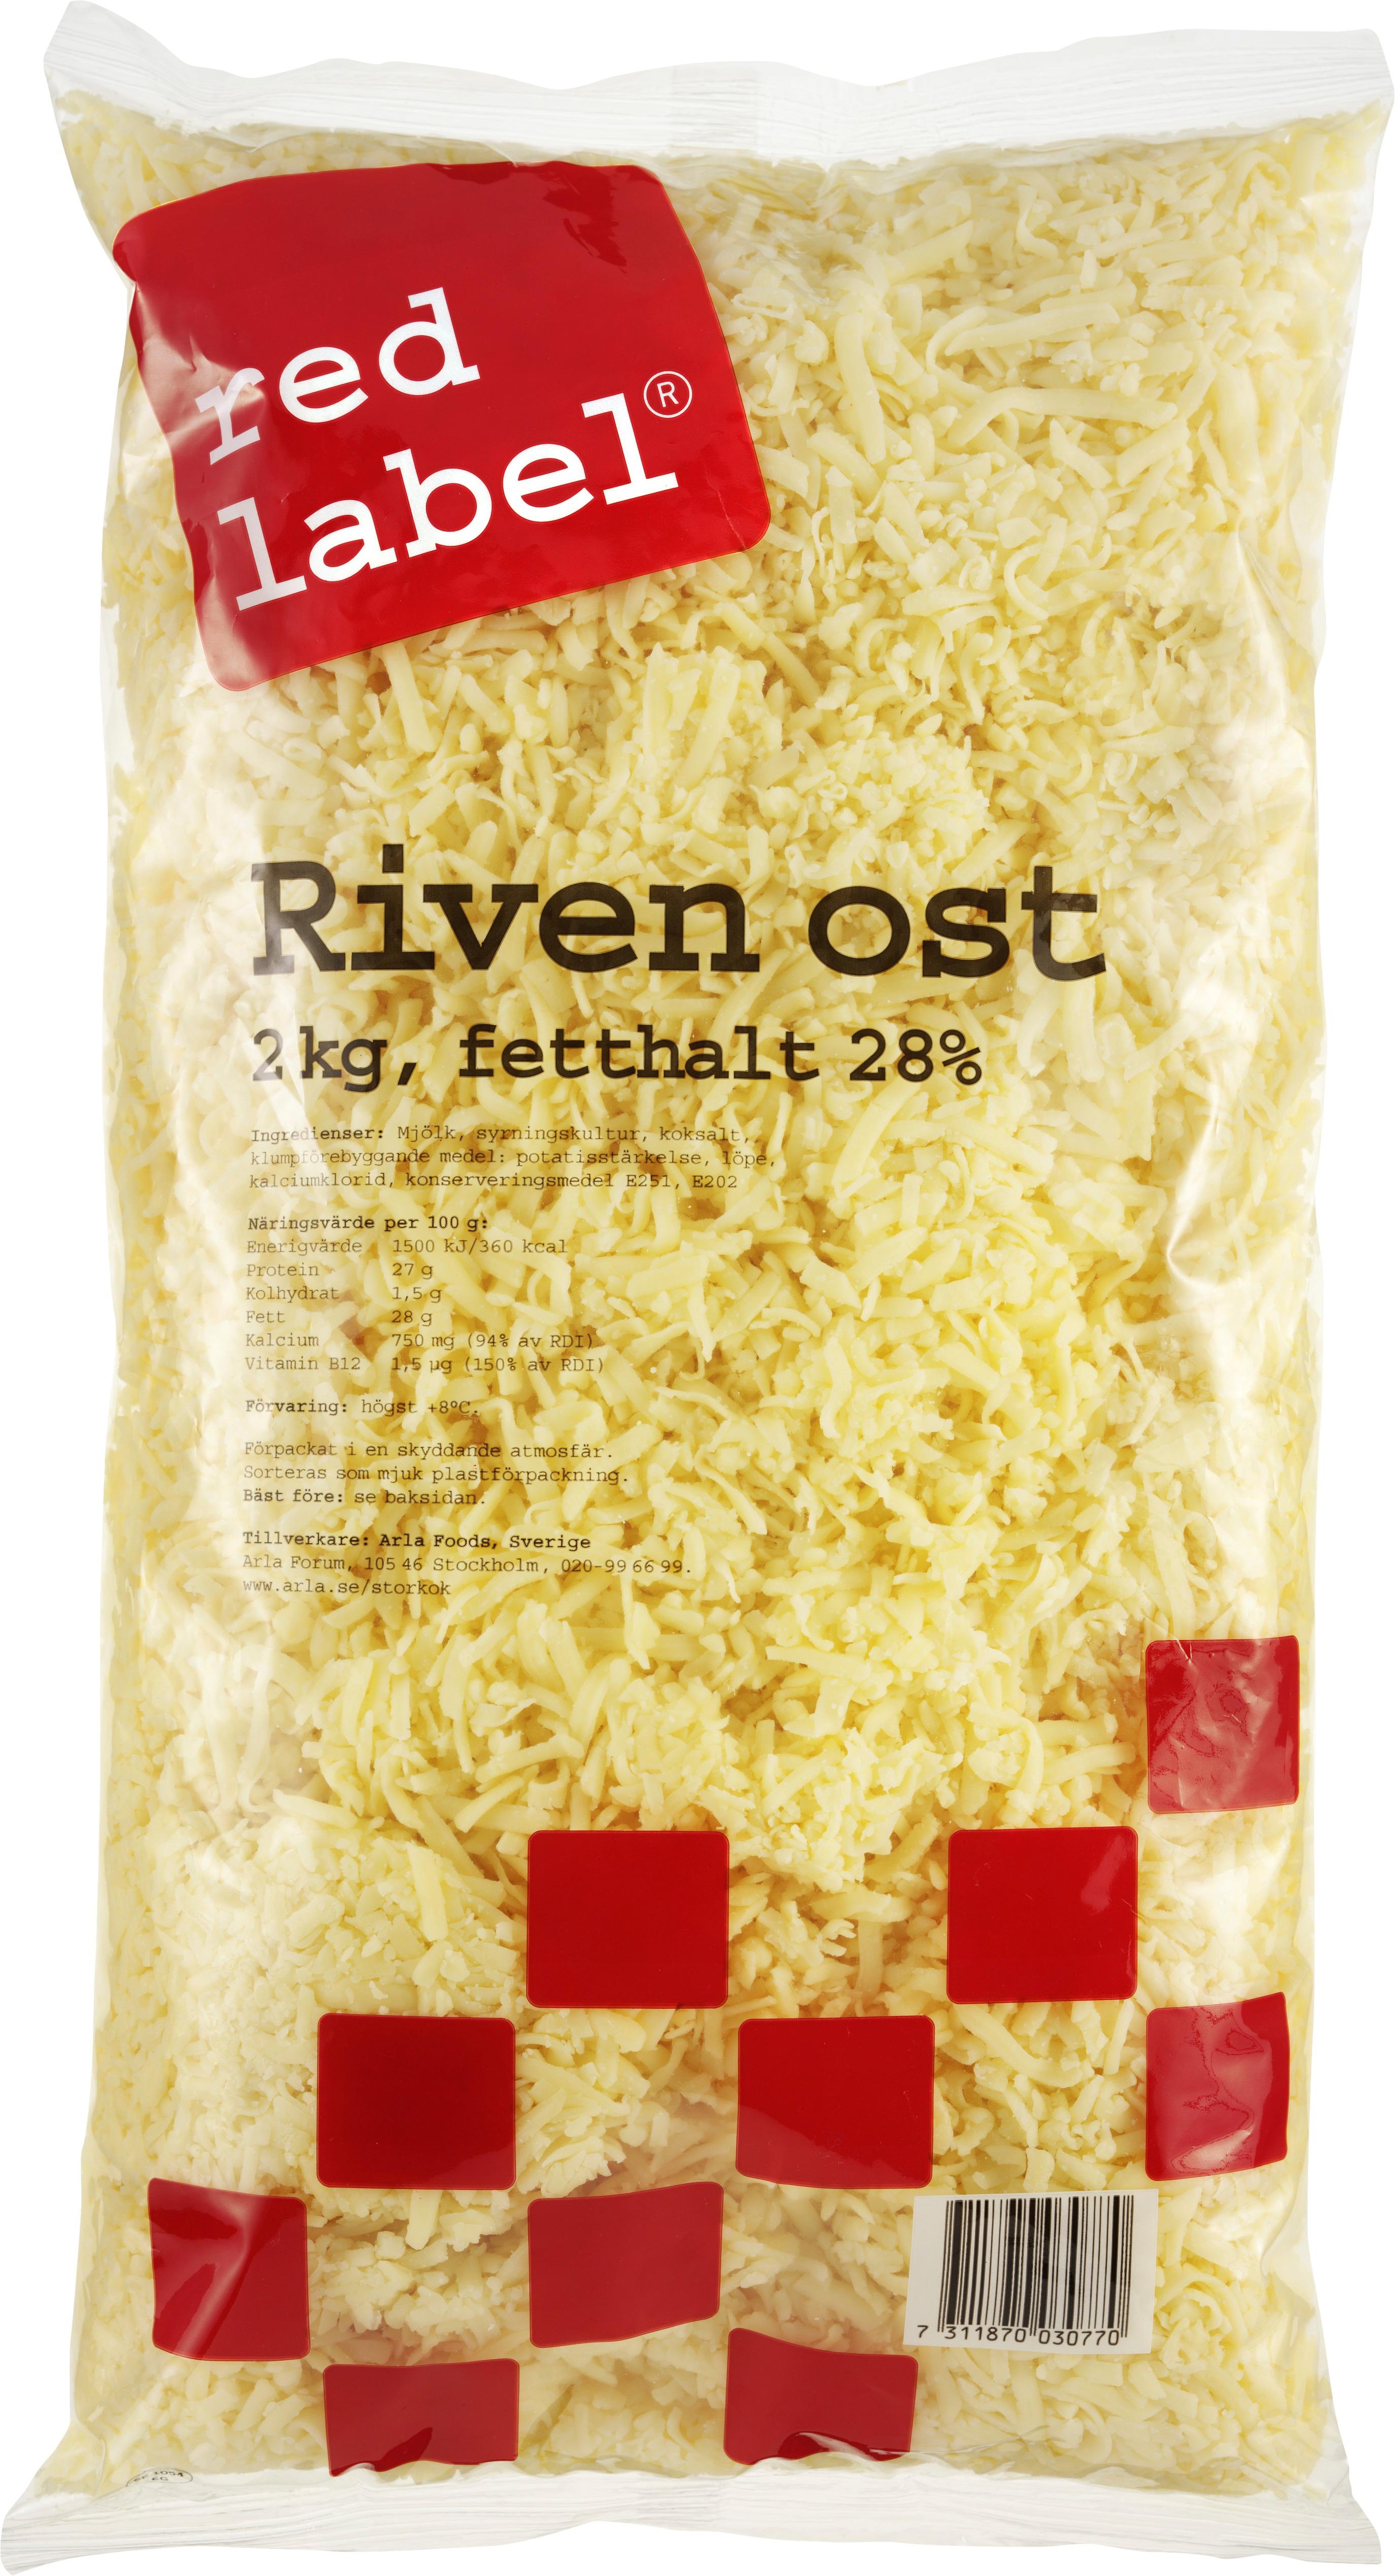 Riven ost 28%